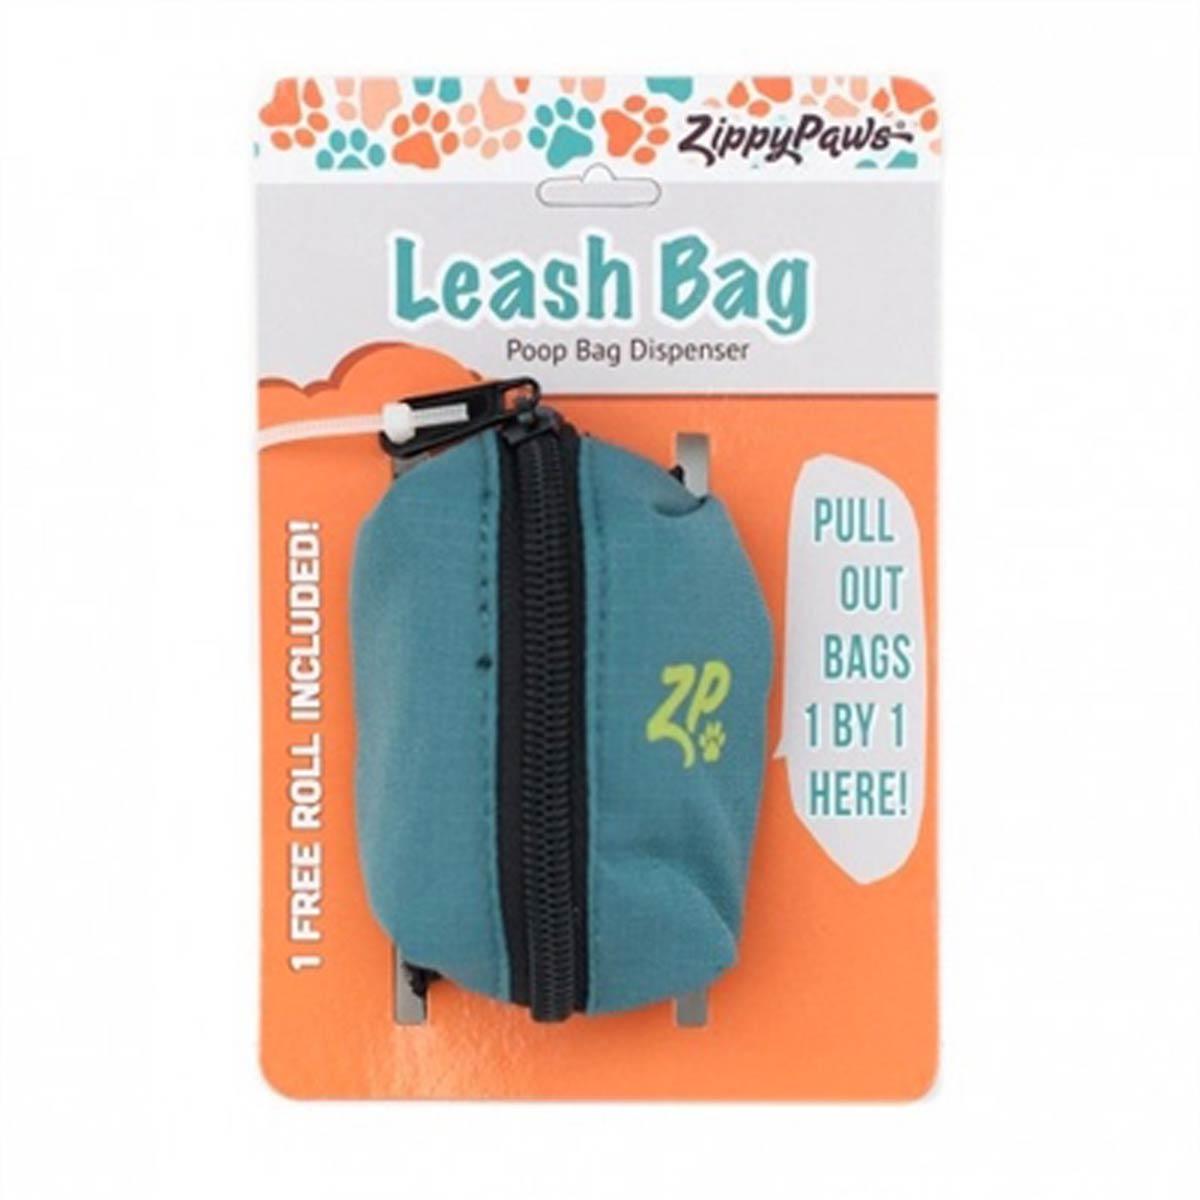 ZippyPaws Adventure Dog Leash Bag - Forest Green